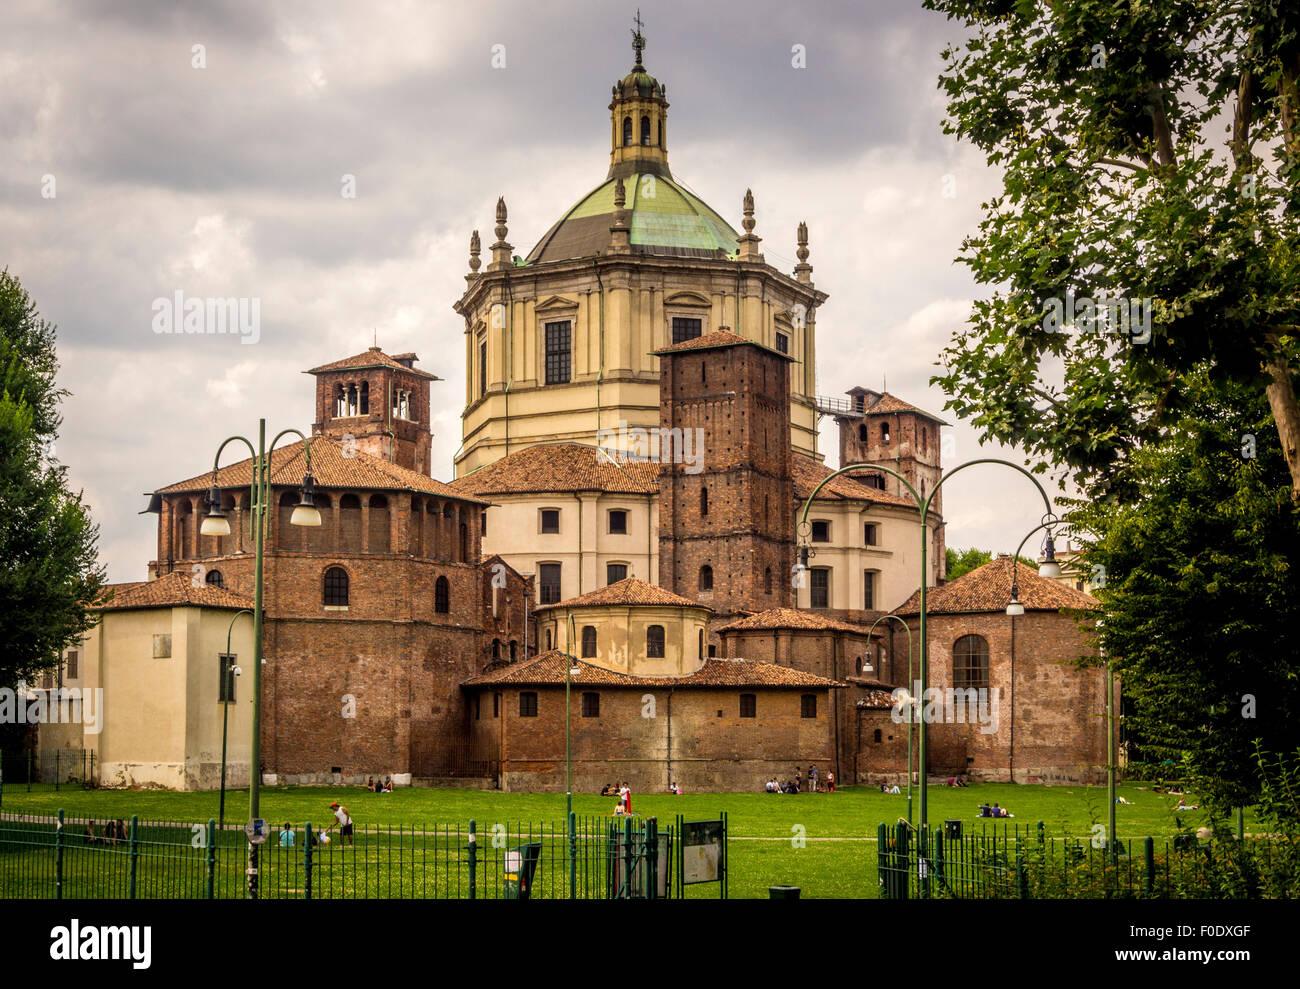 Basilicas Park (Parco delle Basiliche) with Basilica of San Lorenzo, 4th centuary Church. Milan, Italy. - Stock Image